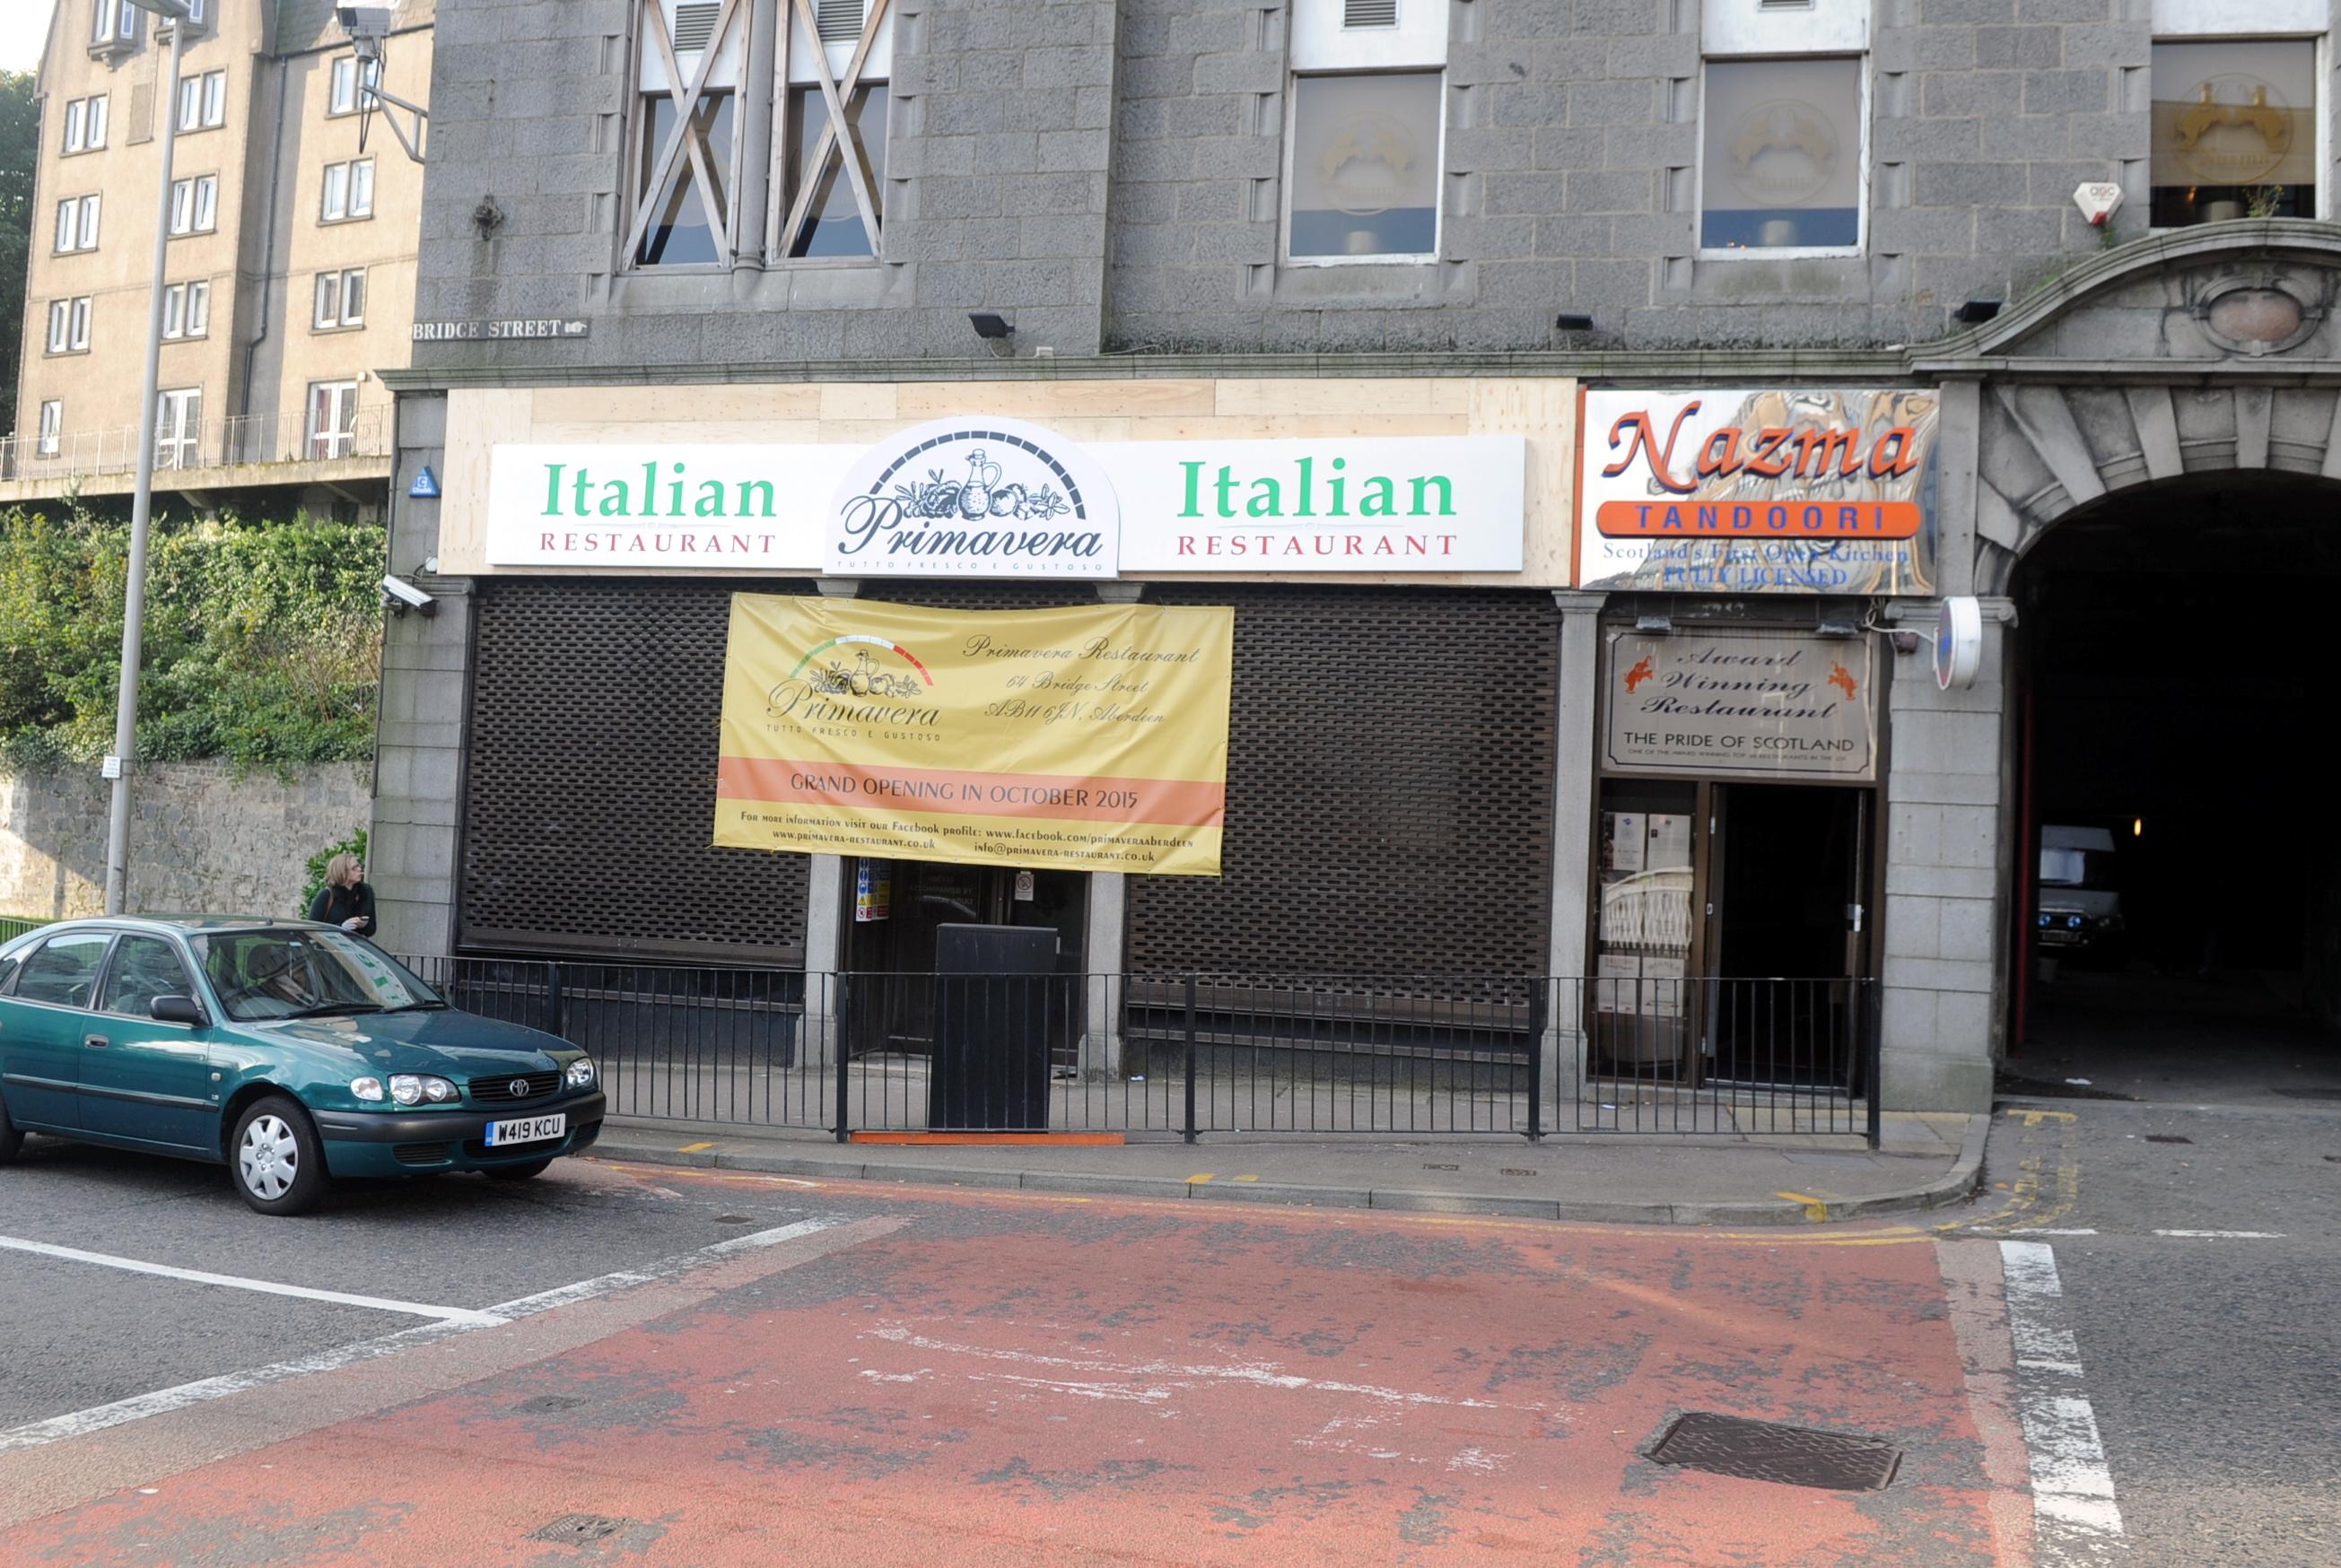 The site of the new restaurant on Bridge Street.